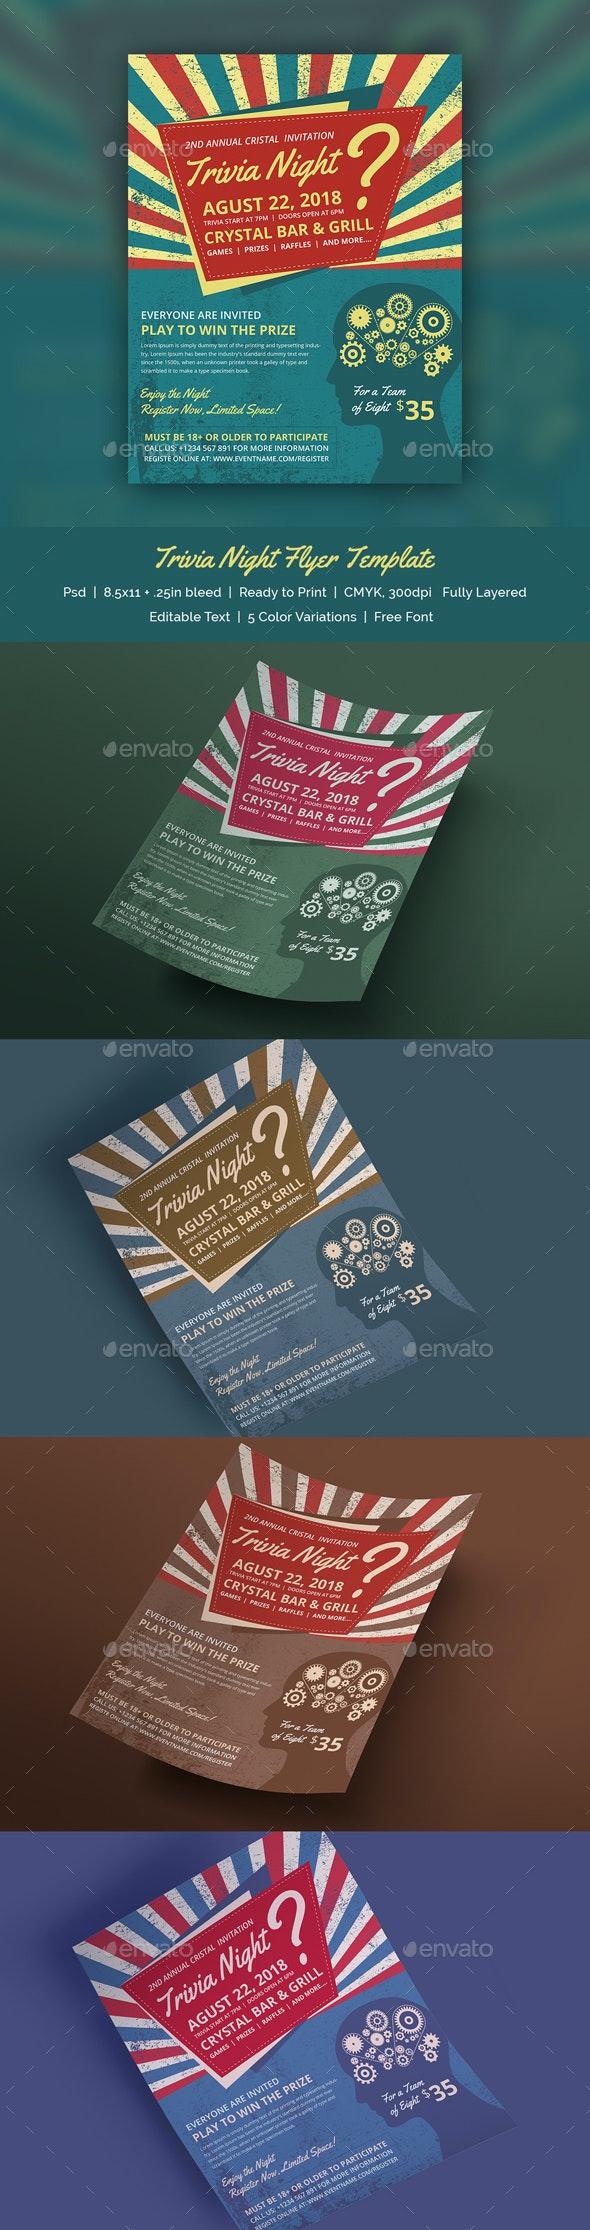 Trivia Night Flyer Template - Print Templates